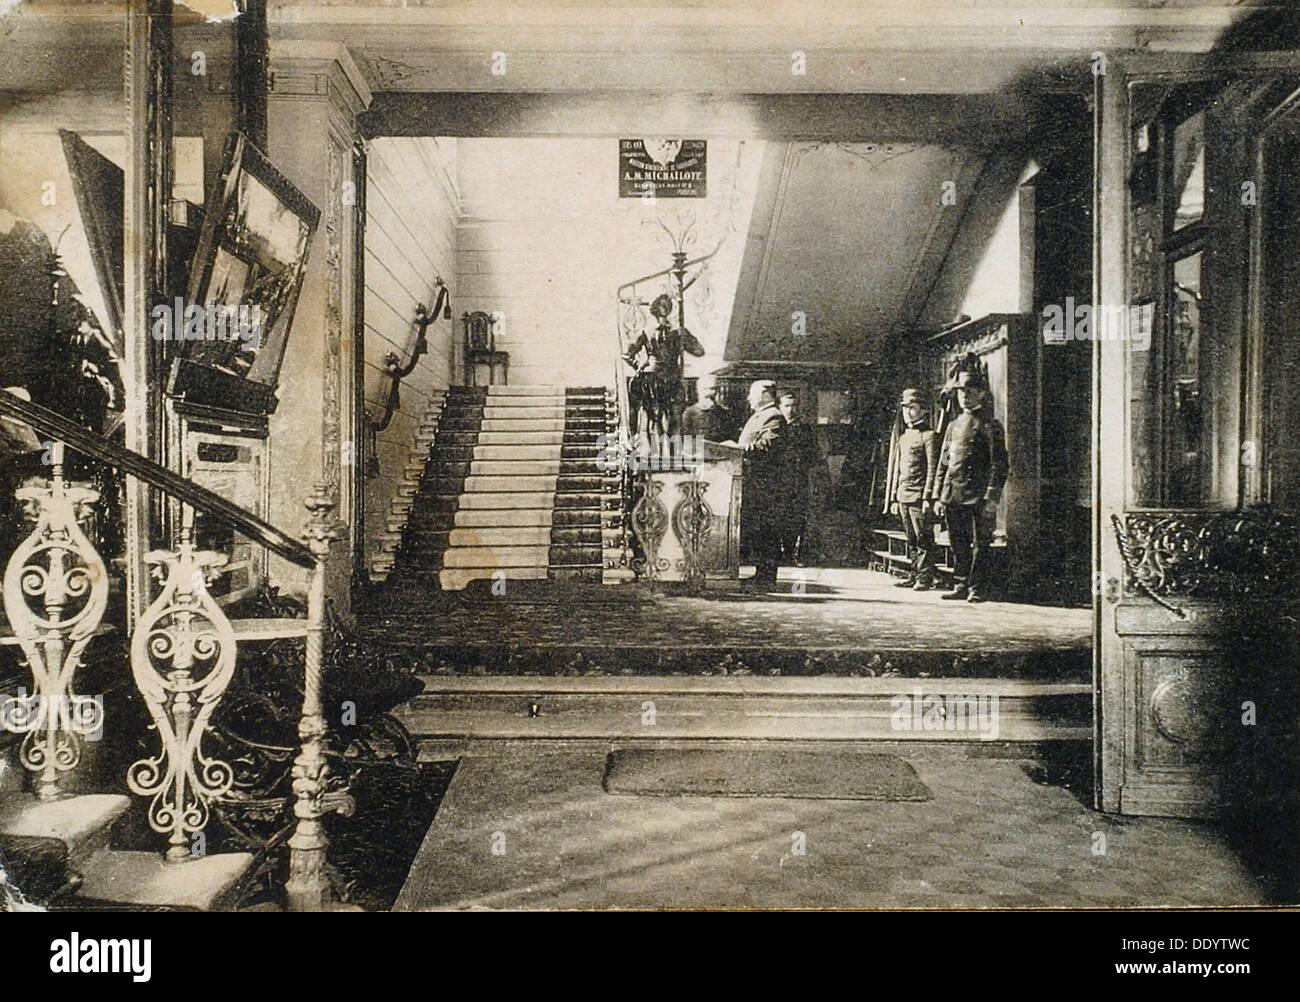 Interior of the Hotel Slavianski Bazaar, Moscow, Russia, early 20th century. - Stock Image